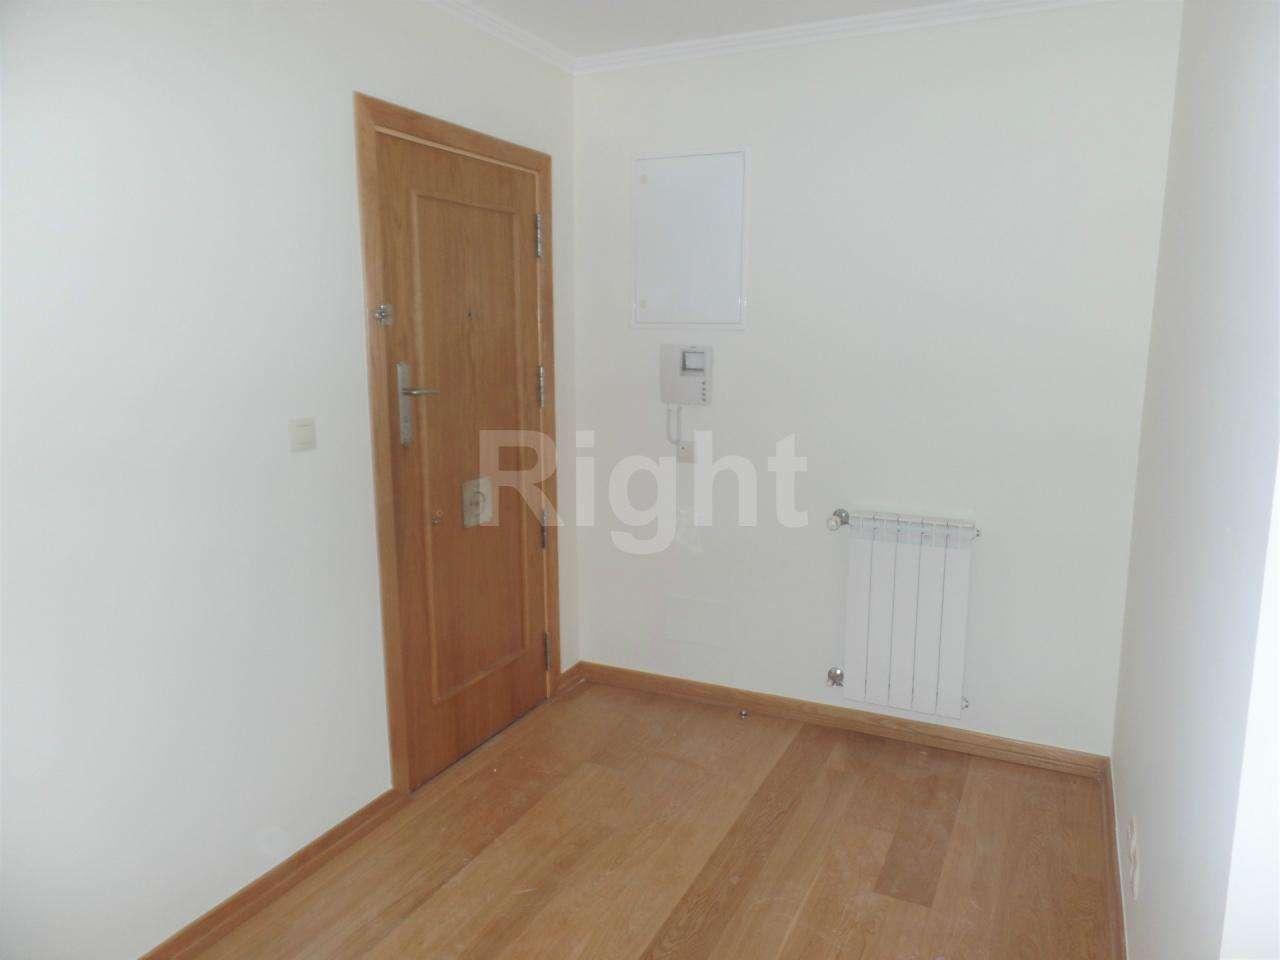 Apartamento para arrendar, Benfica, Lisboa - Foto 24